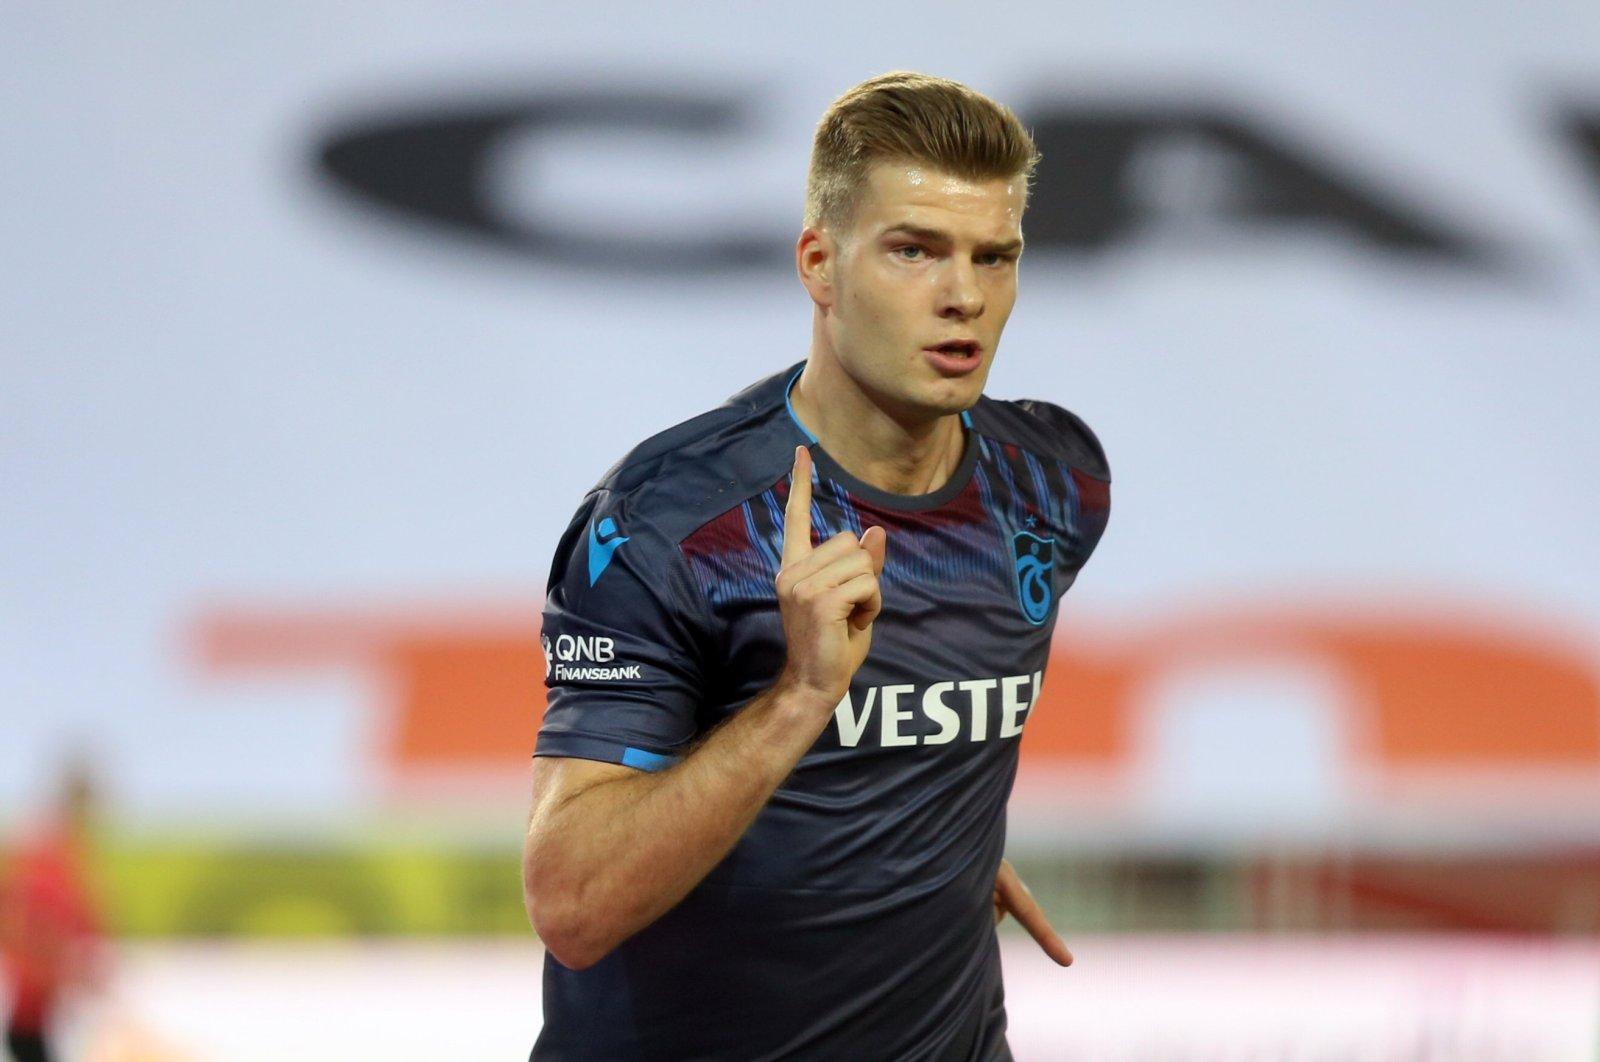 Alexander Sorloth celebrates his goal in a game against Ankaragücü, Trabzon, June 27, 2020. (AA Photo)